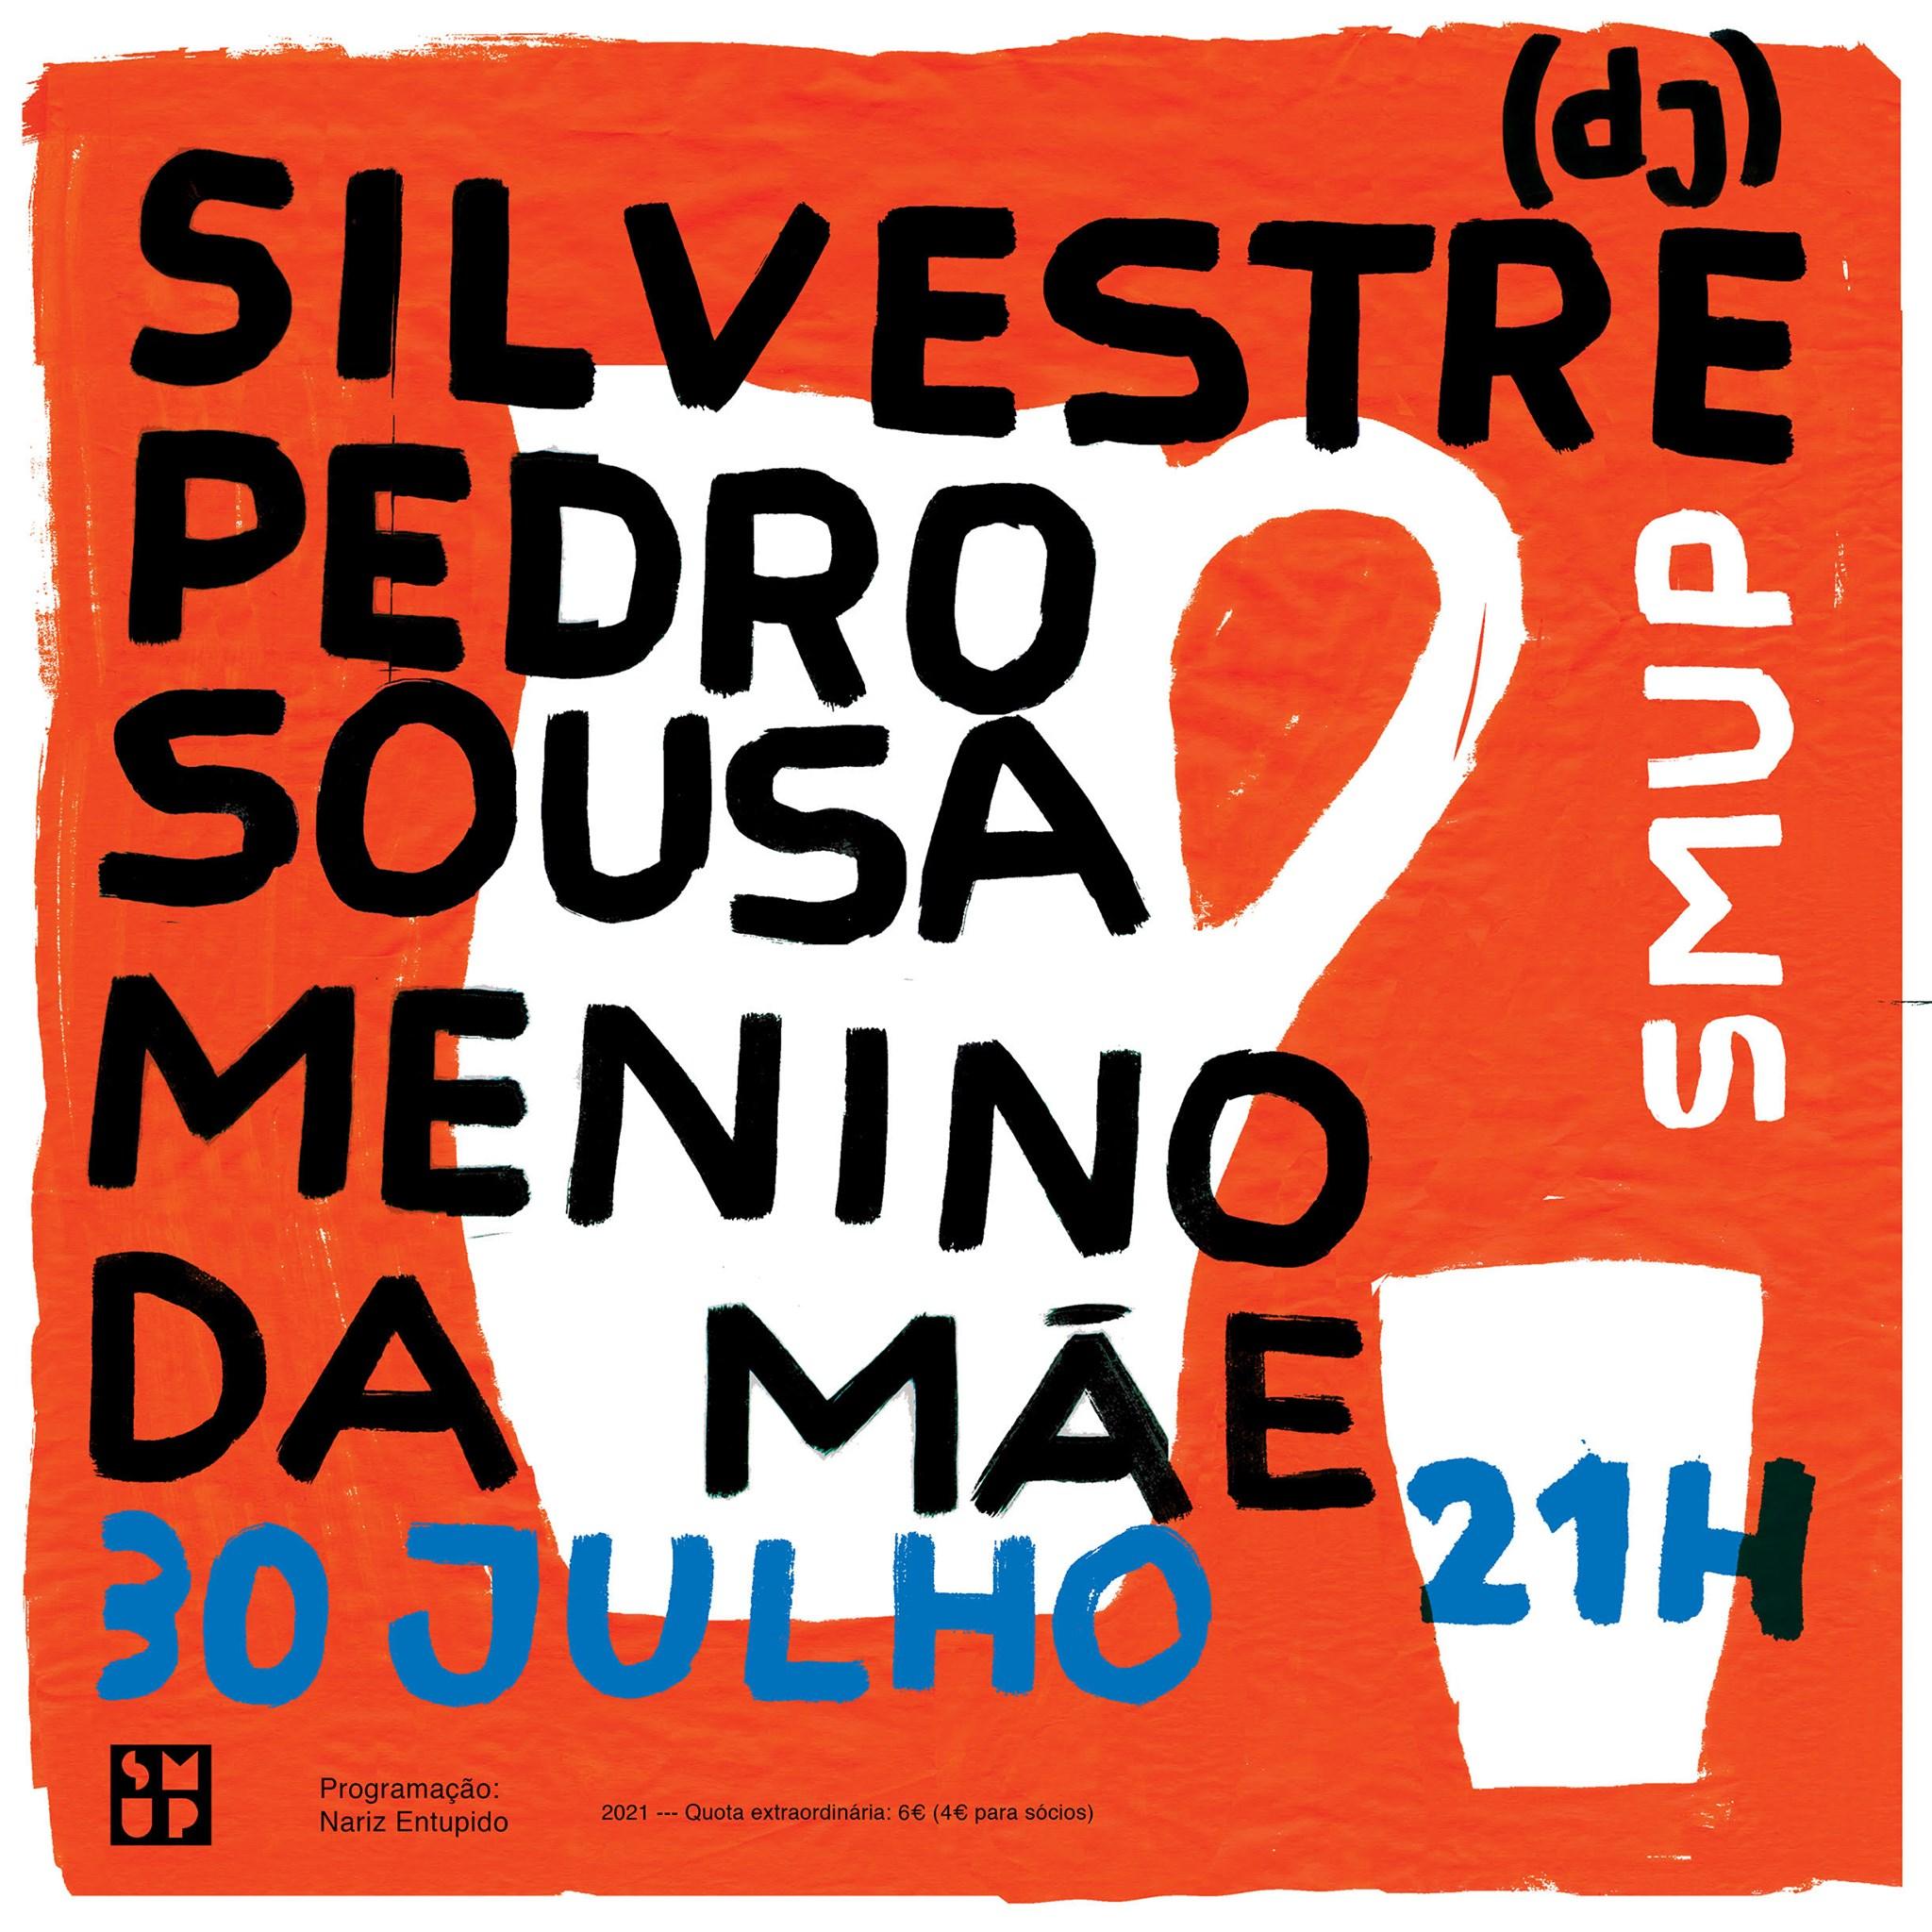 Menino da Mãe | Pedro Sousa | Silvestre (dj)